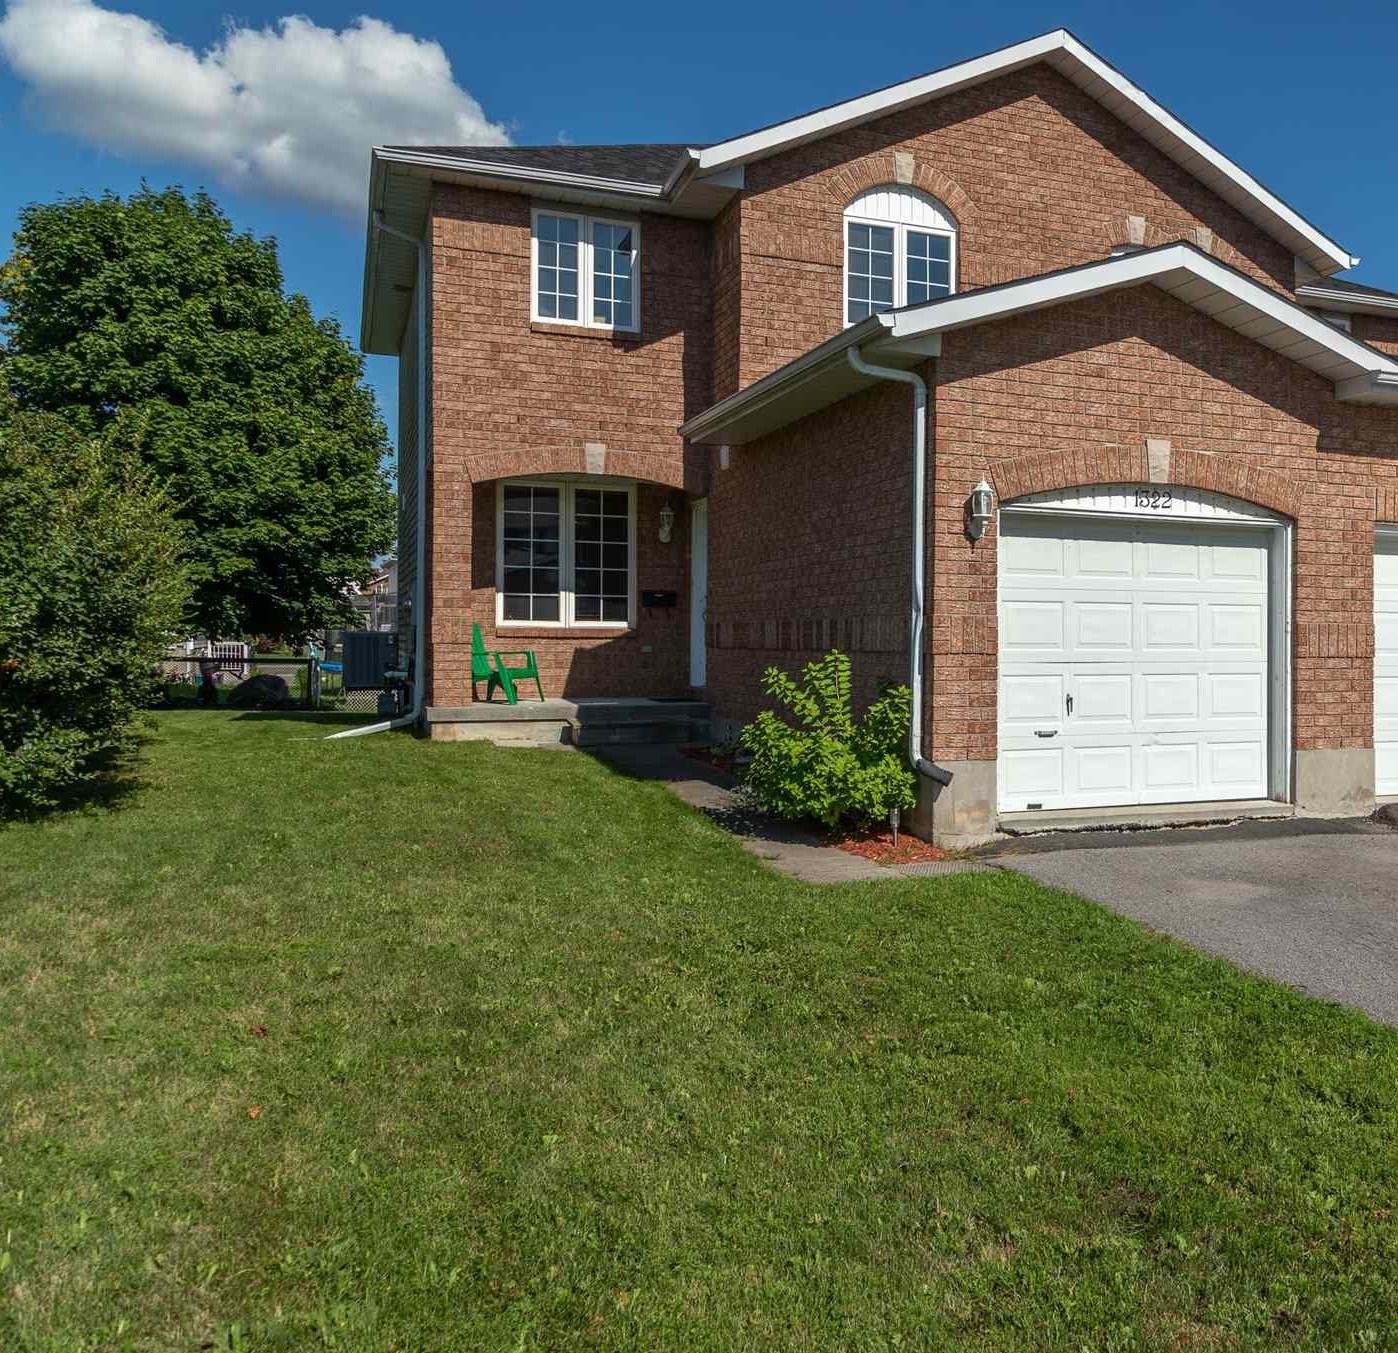 1322 Thornwood Crescent, Kingston Ontario, Canada